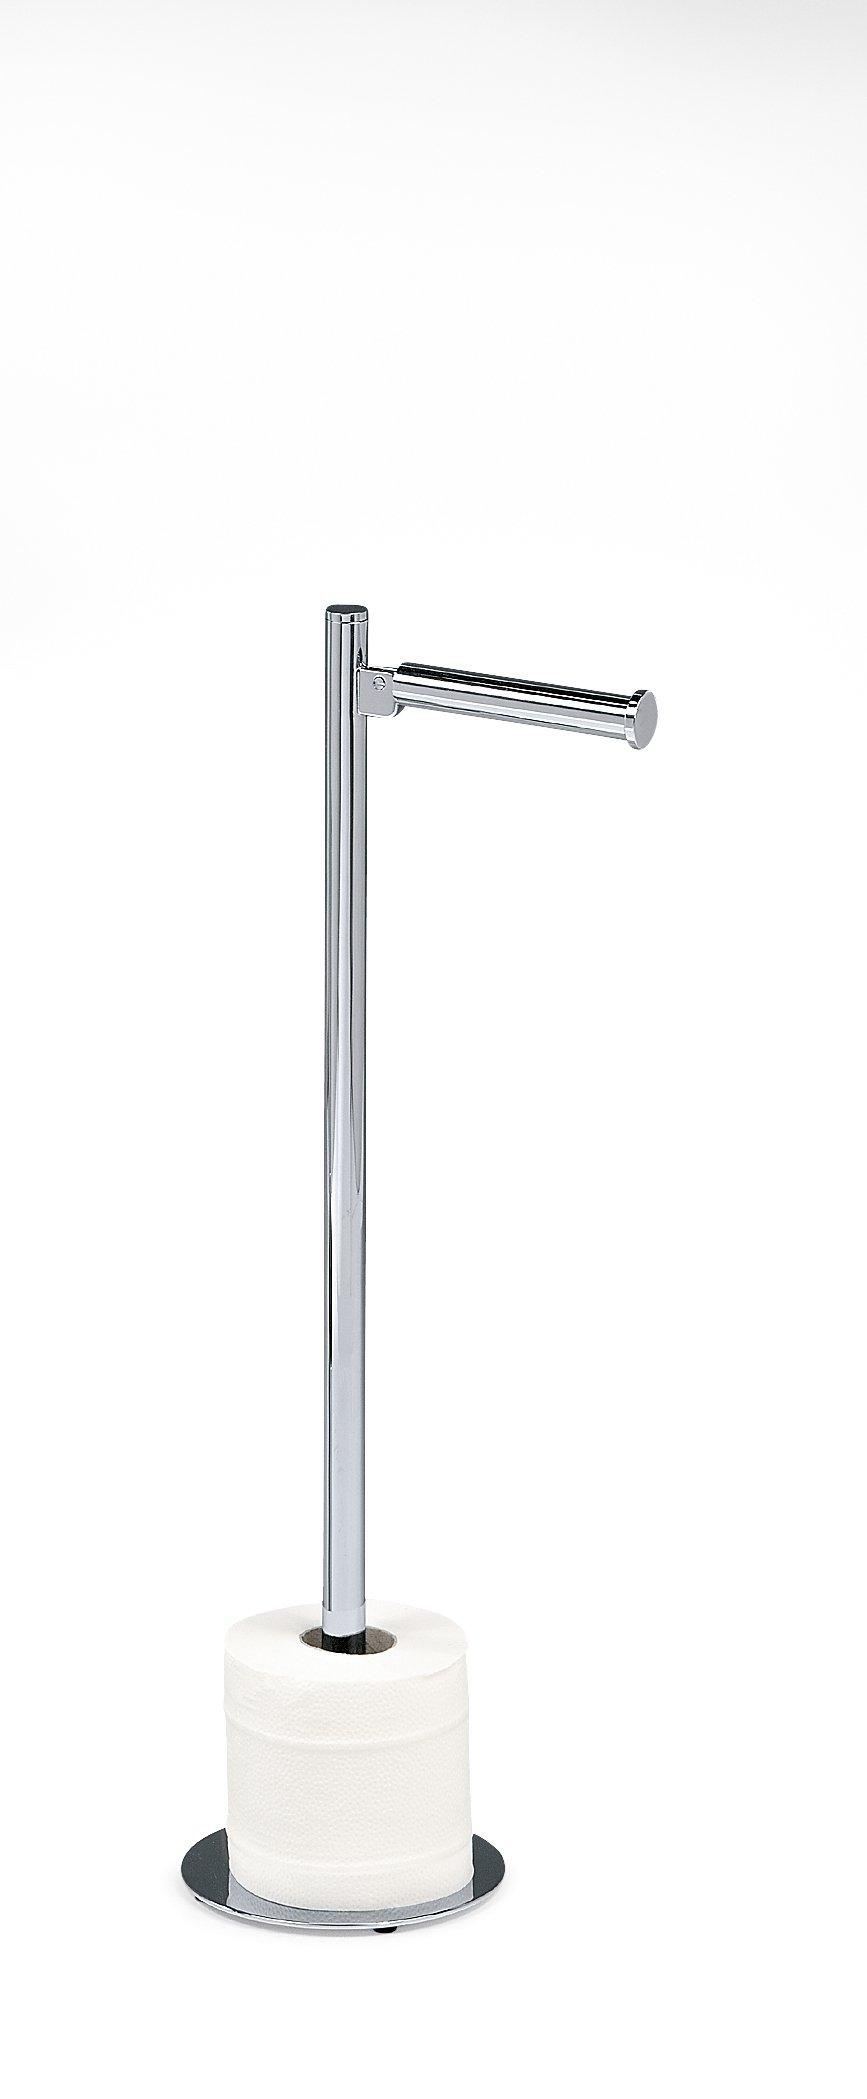 DWBA Free Standing Brass Toilet Paper Holder for Bathroom Storage/ Bathroom Paper Toilet Dispenser Tissue Roll Hanger Holder Spare Contemporary Round (Polished Chrome)